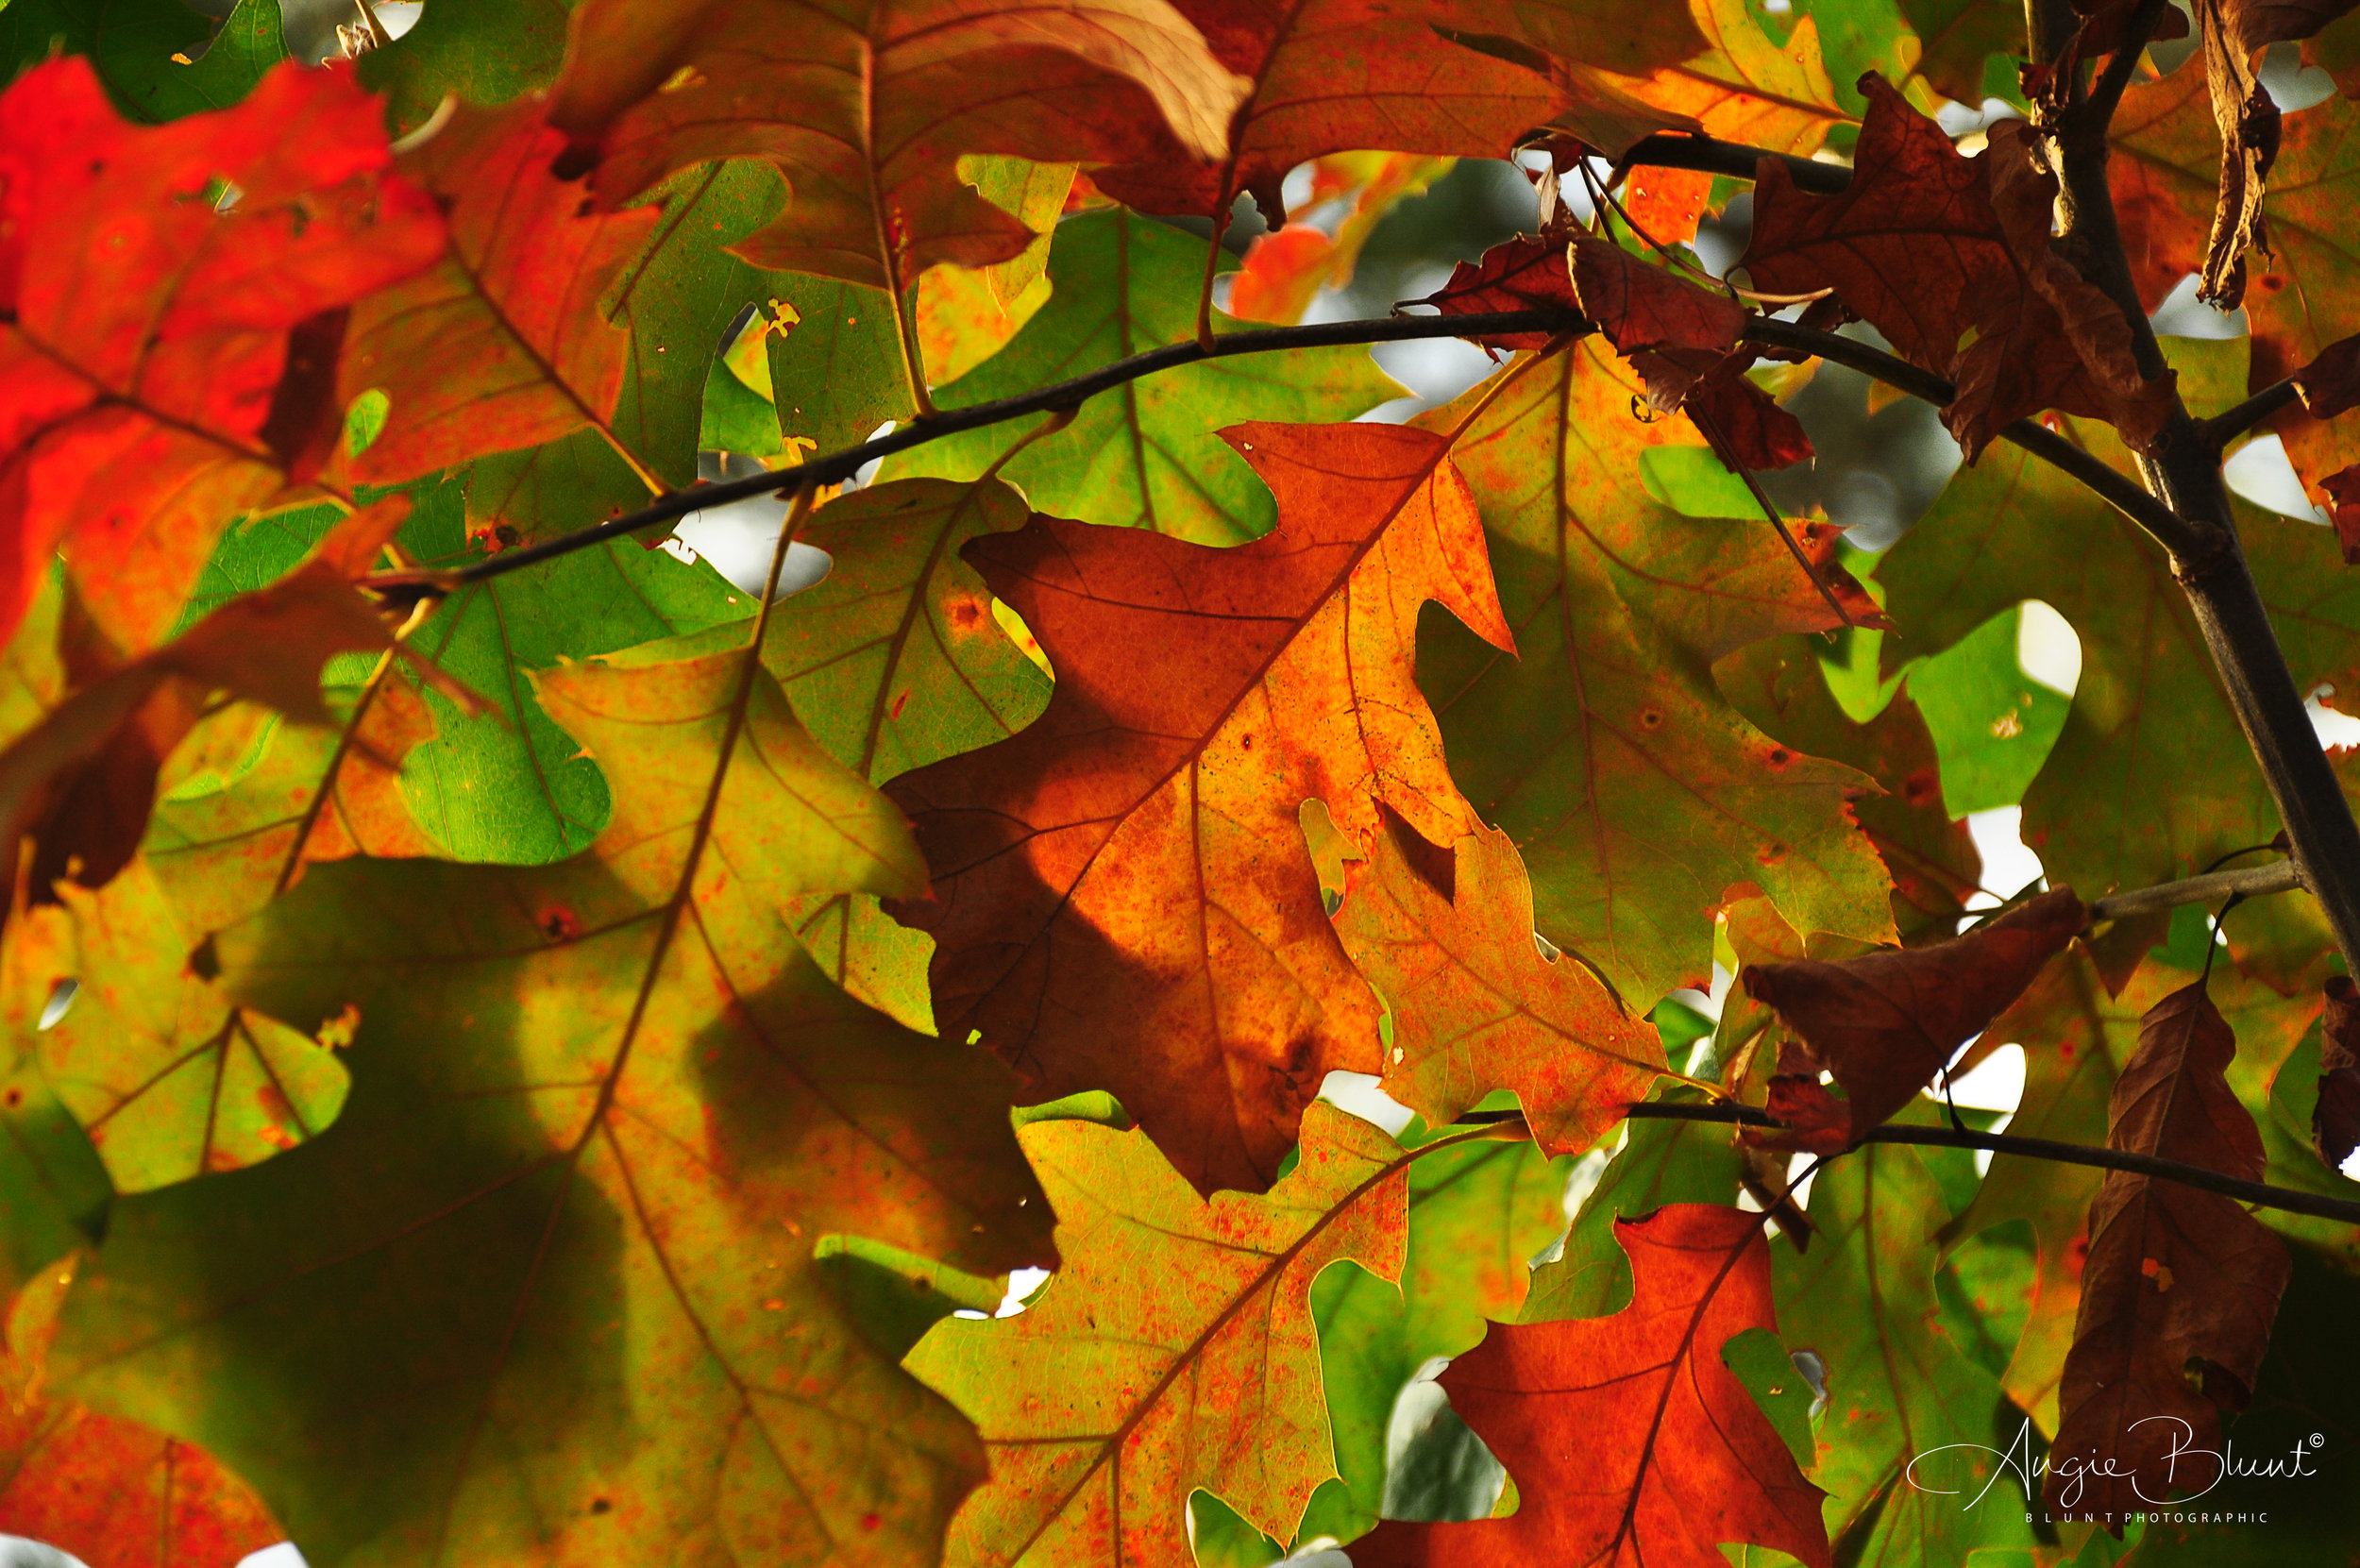 October Oak Leaves at Nimisila, Green, Ohio (2011) -  Doug Blunt